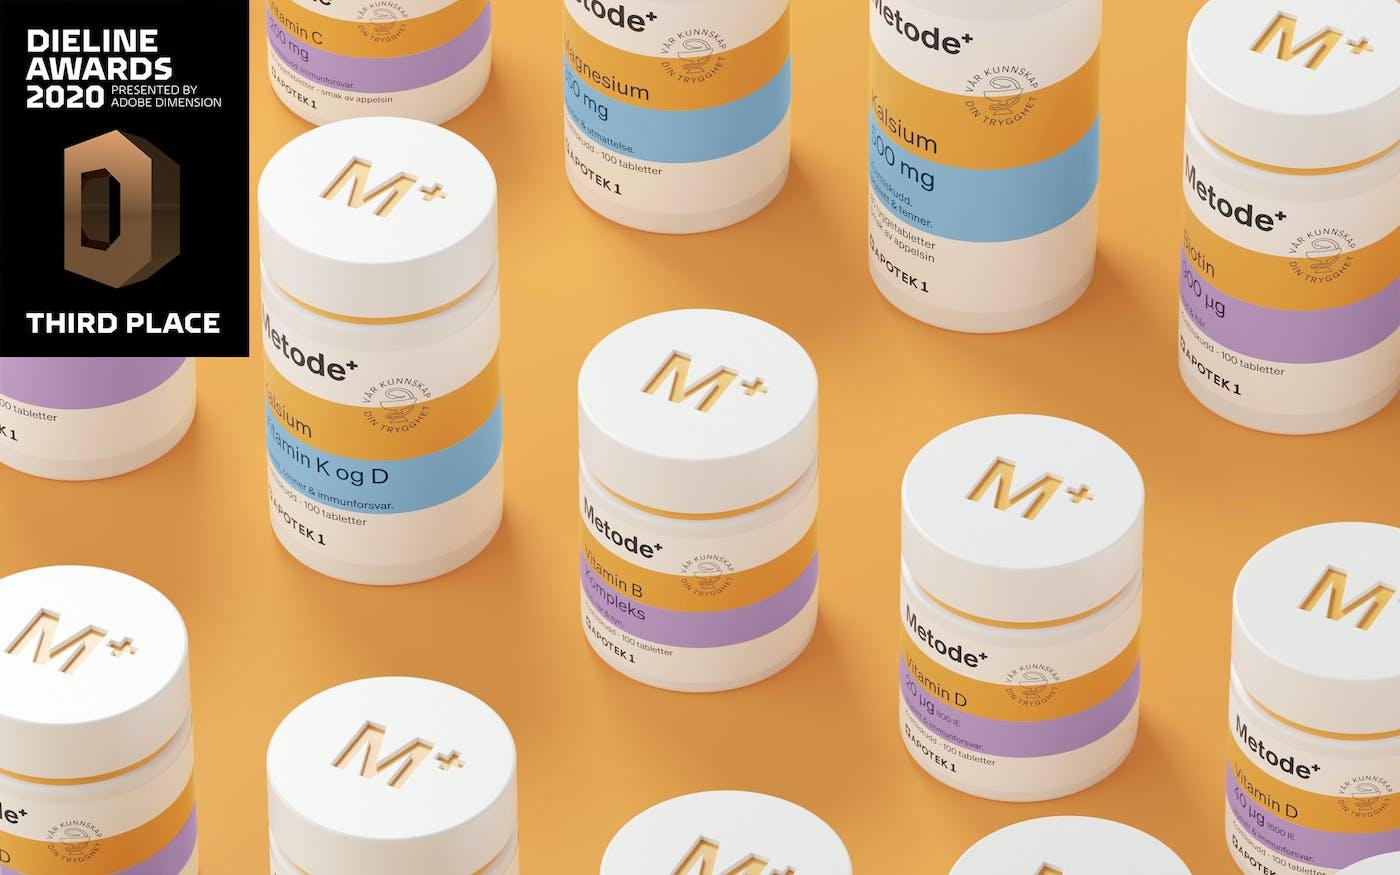 Metode by Goods Vitamin Lids